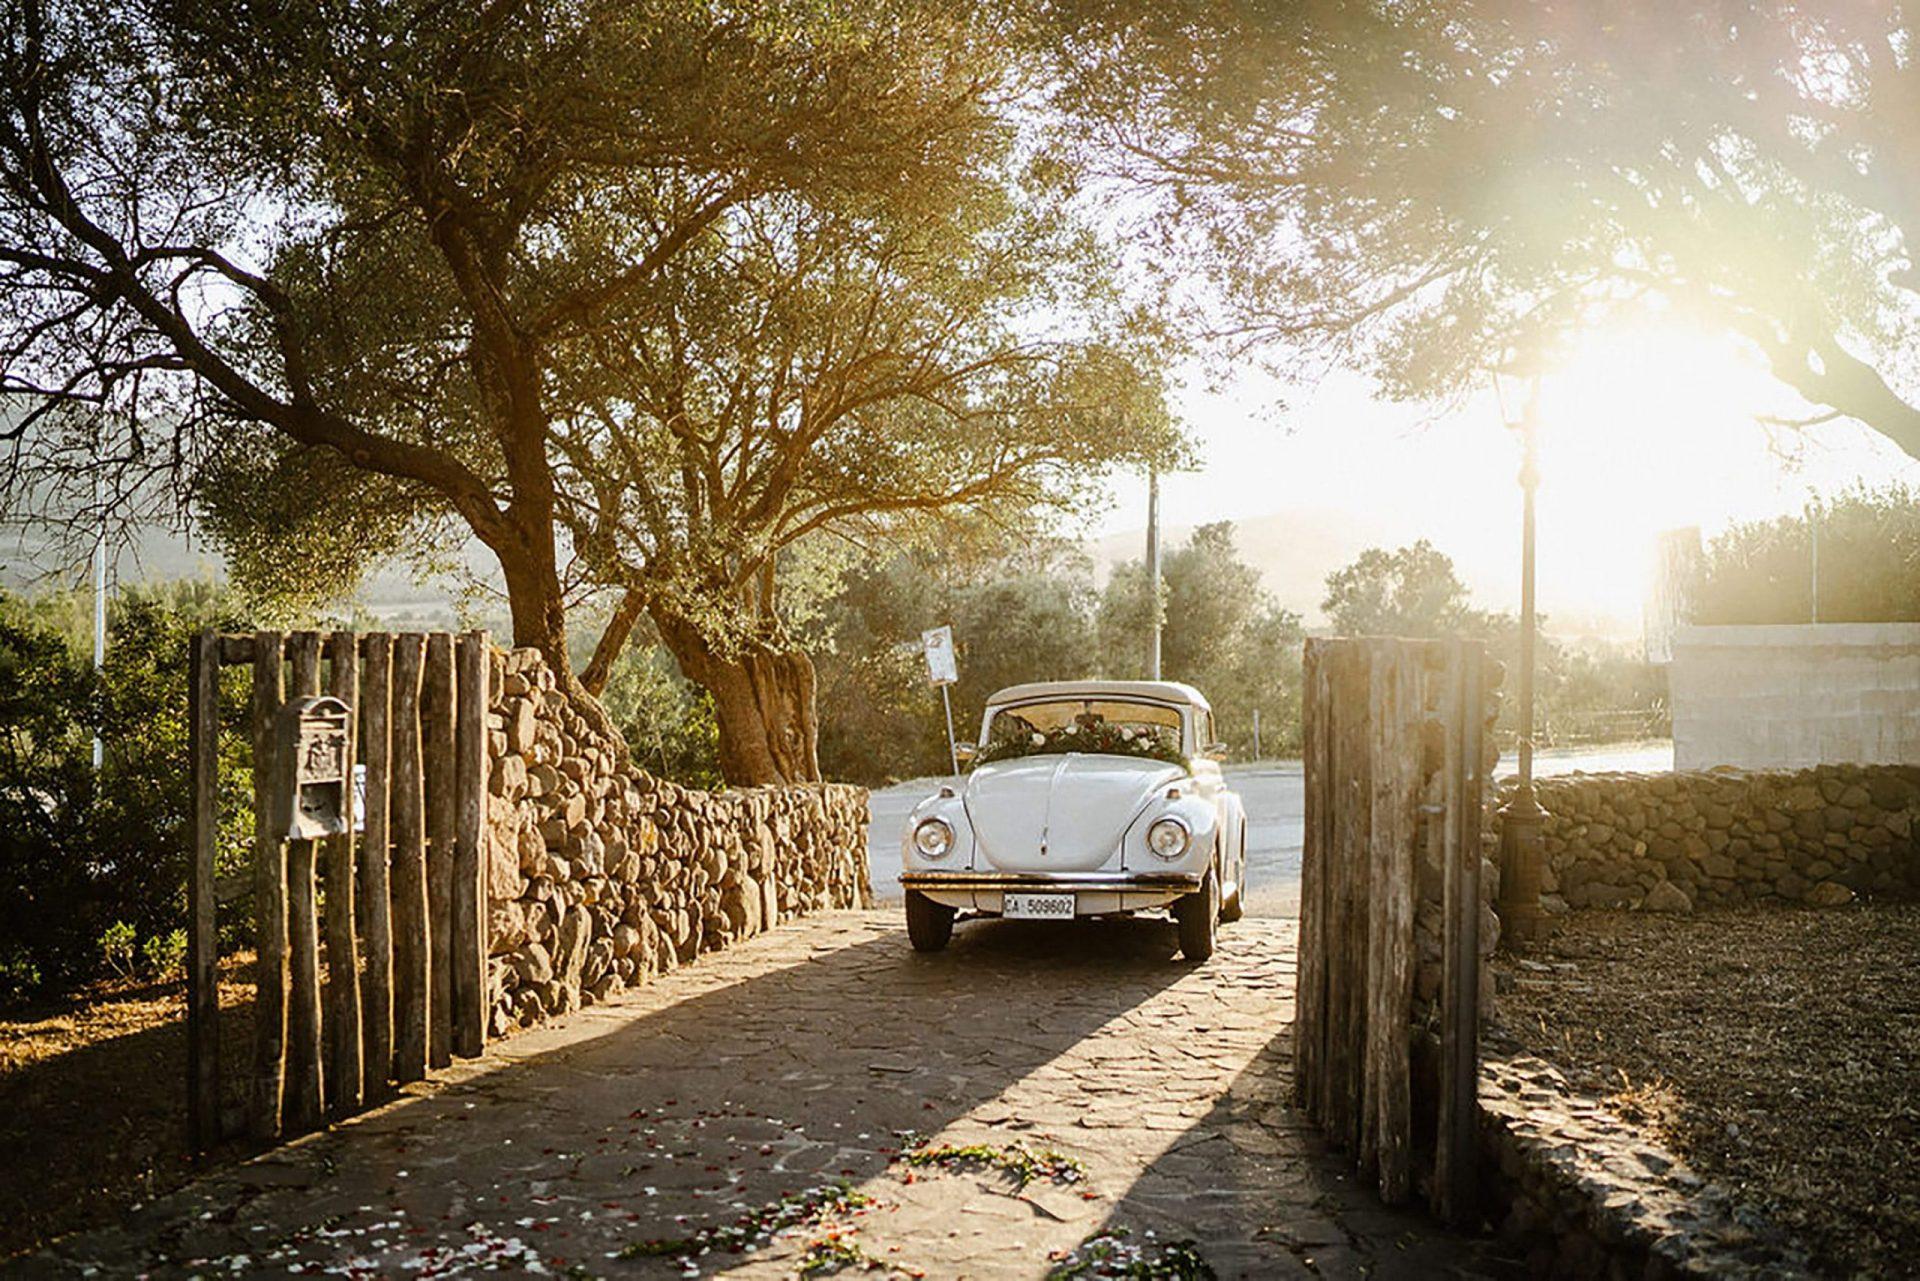 Marianna & Matteo, the spouses car